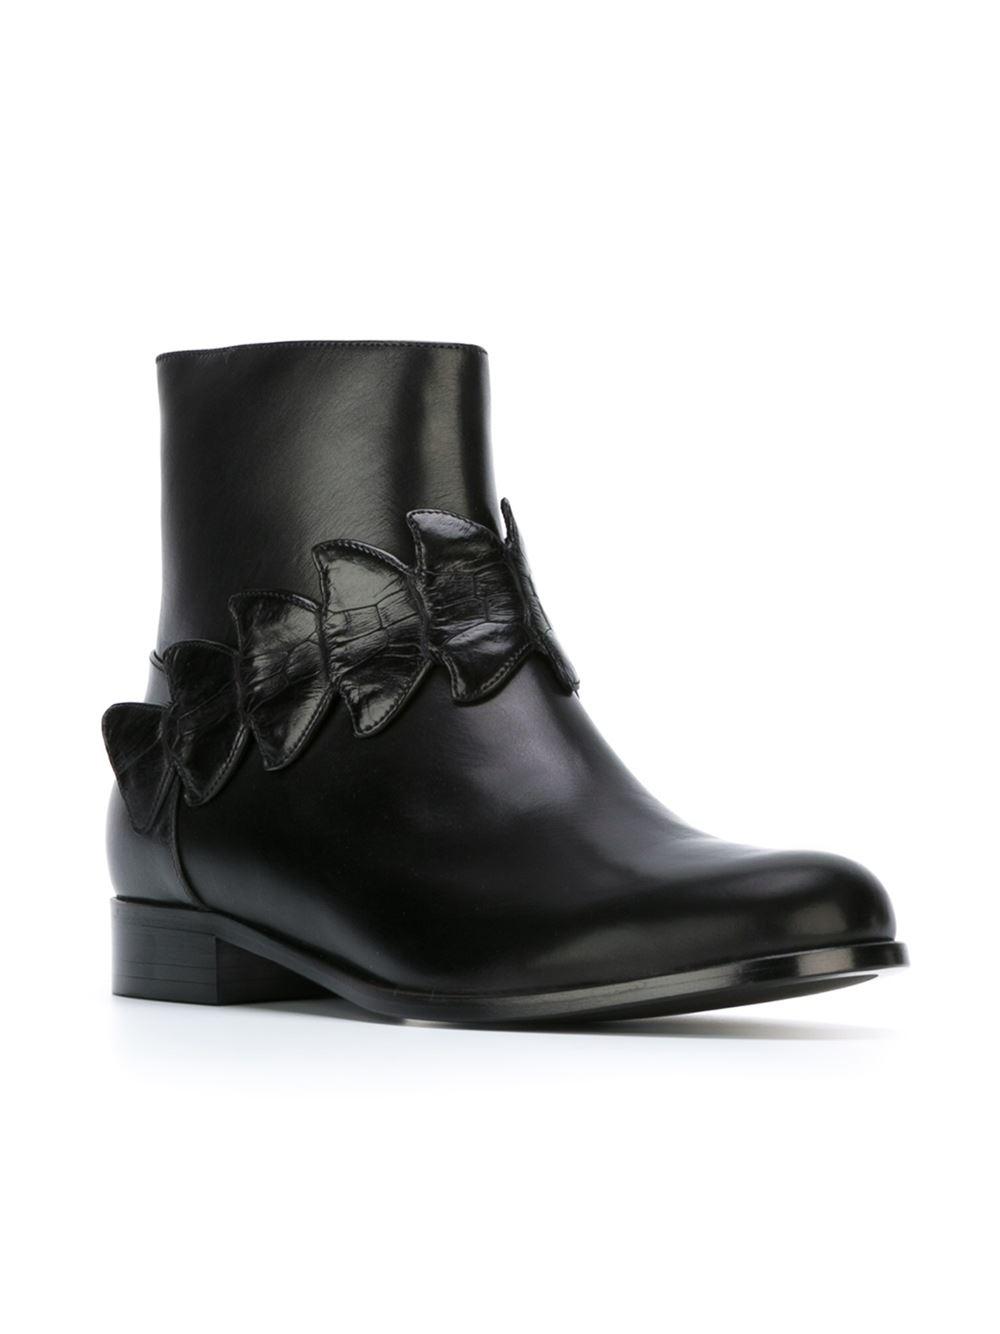 Fendi Crocodile Effect Detail Ankle Boots In Black Lyst